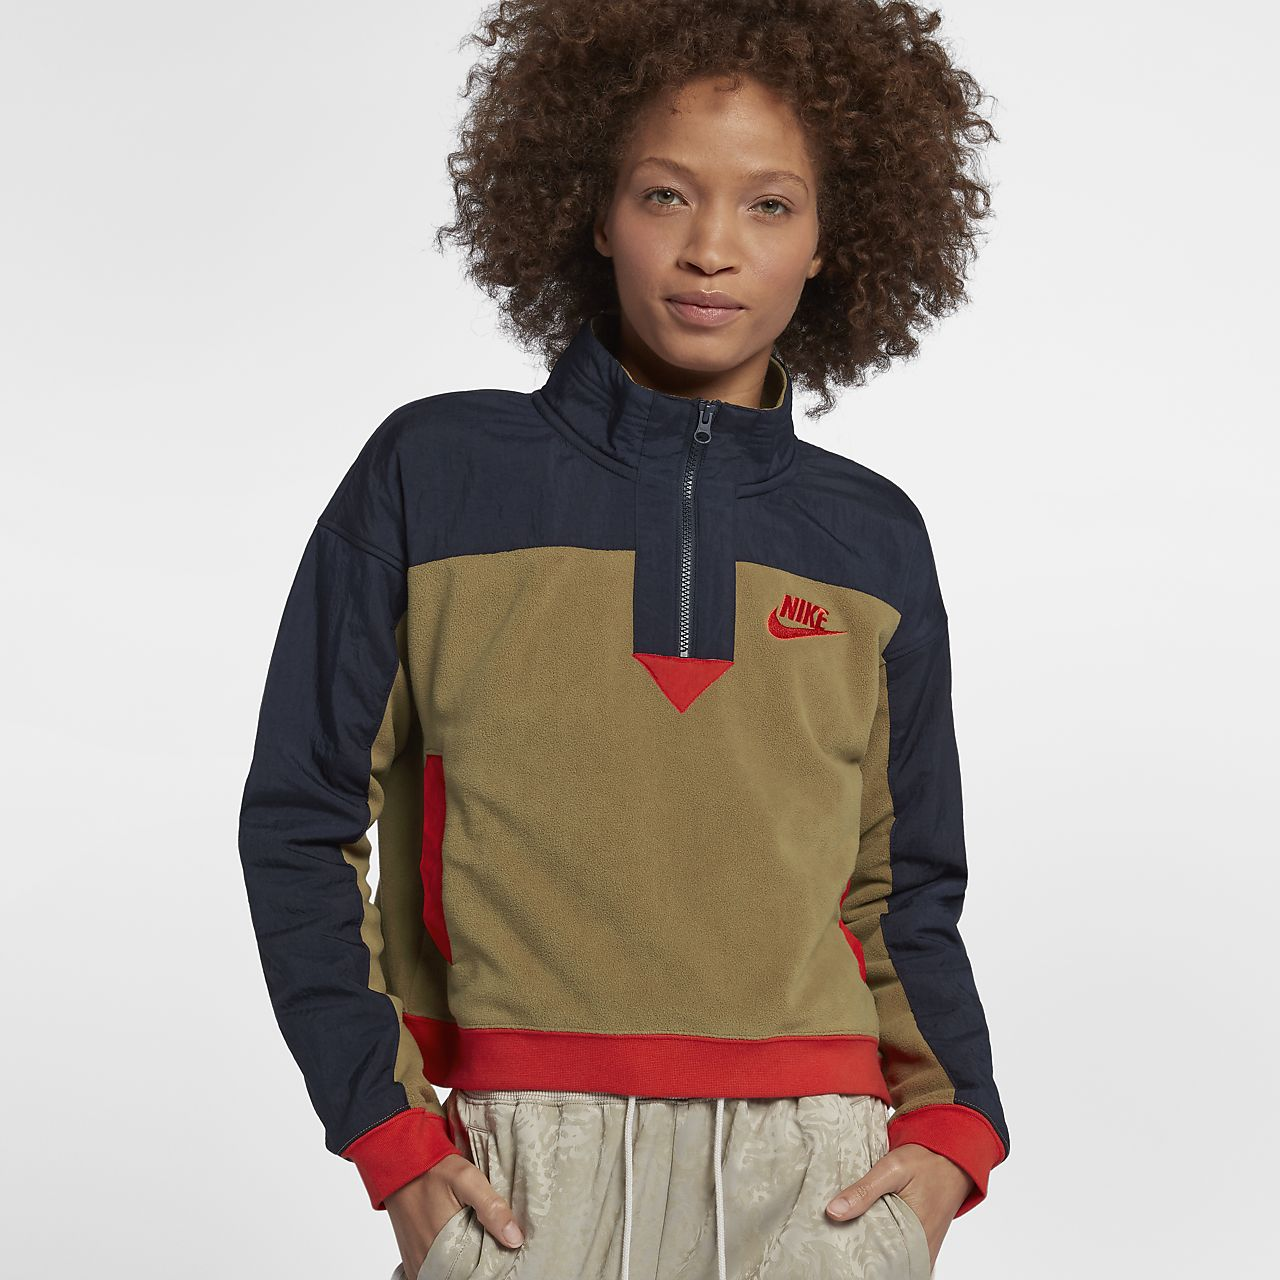 Demi À Haut Sportswear Zip Nike Femme Pour qHdFF5f1wx